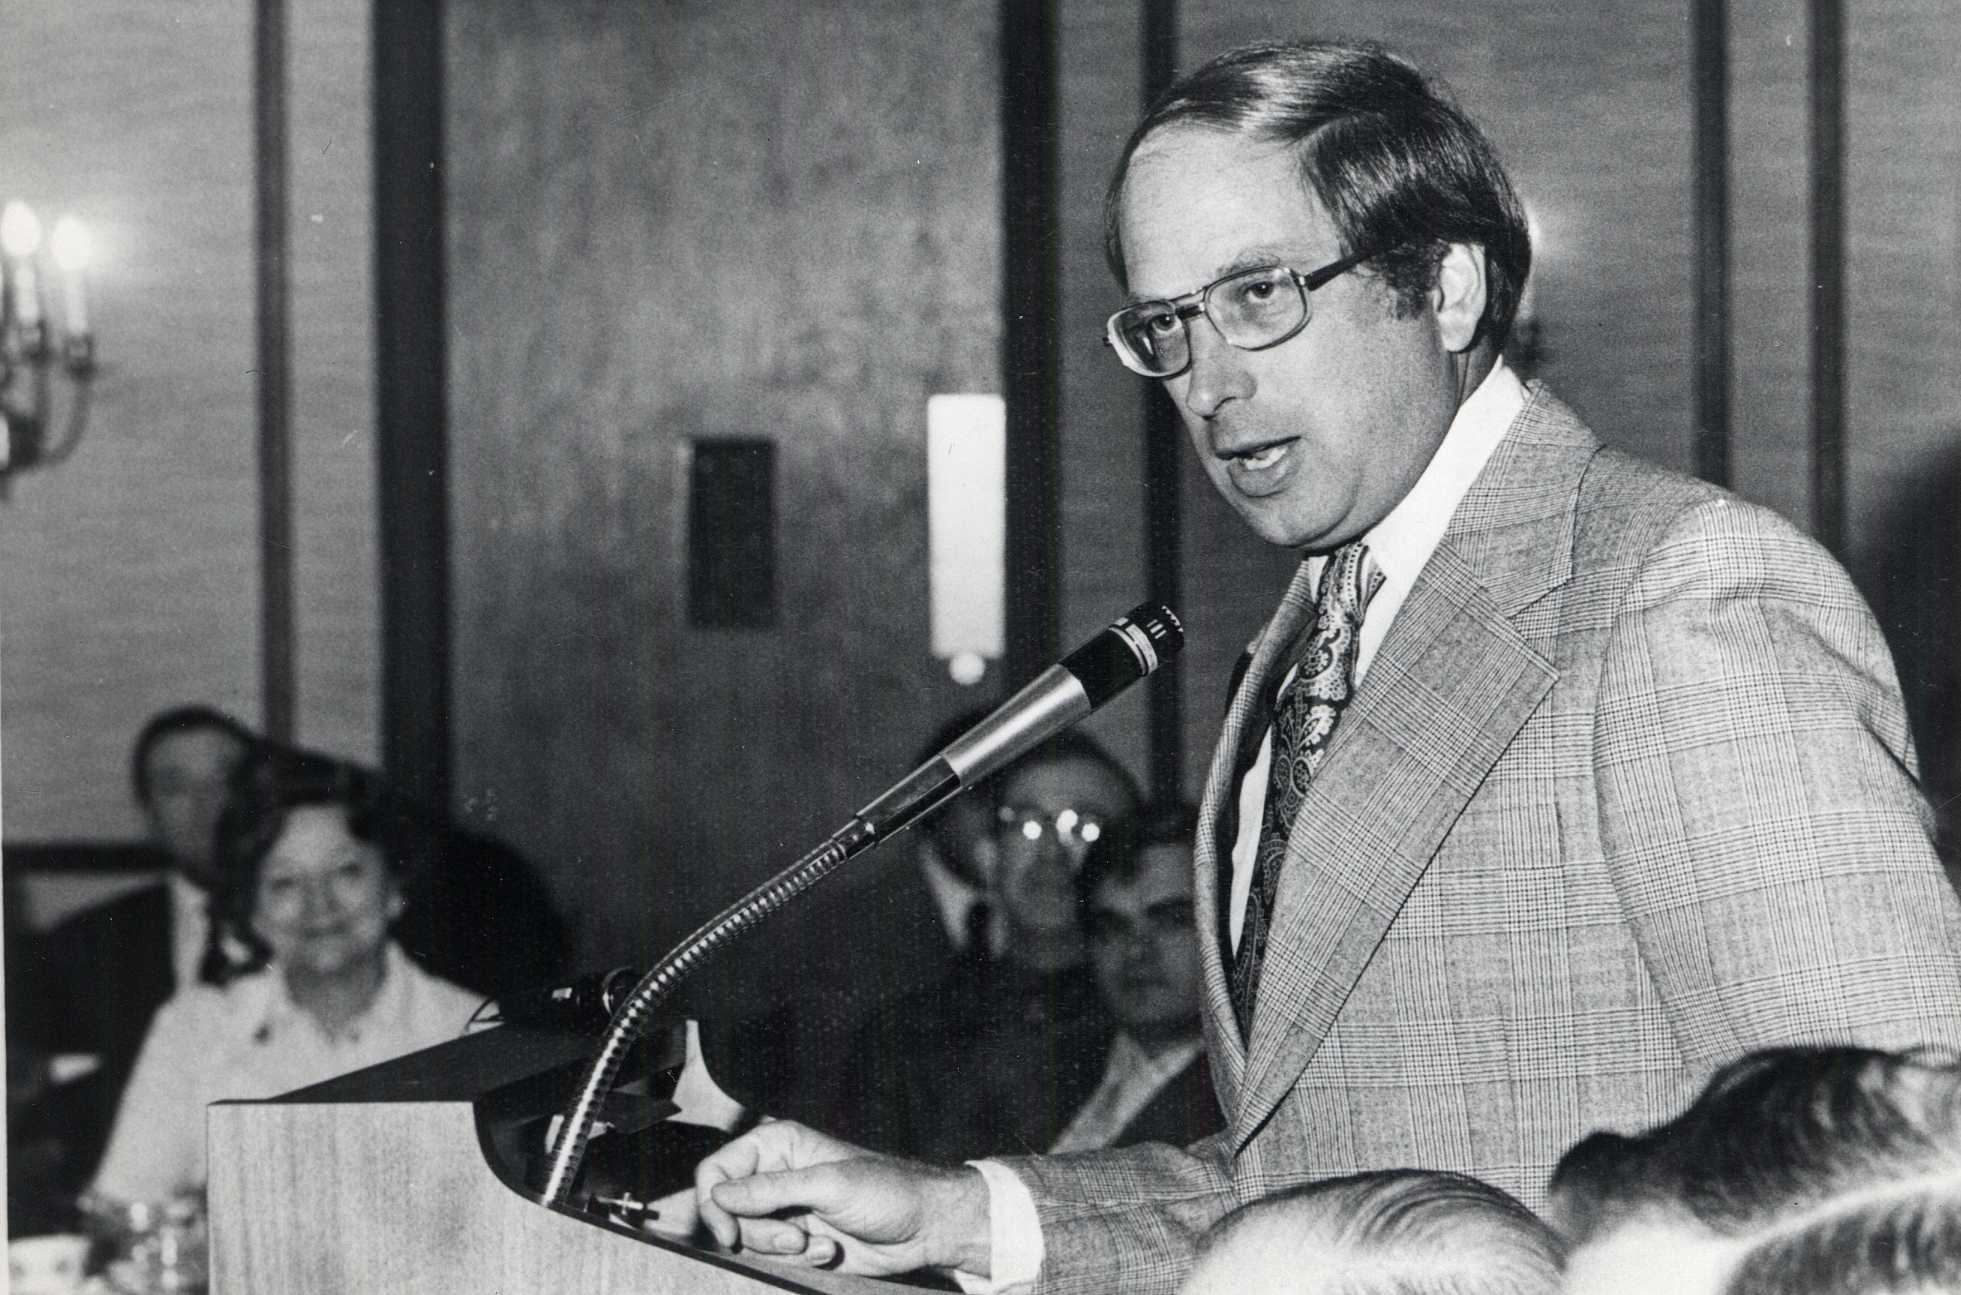 Senator Sam Nunn Speaks at the Plaza Restaurant, c.1975